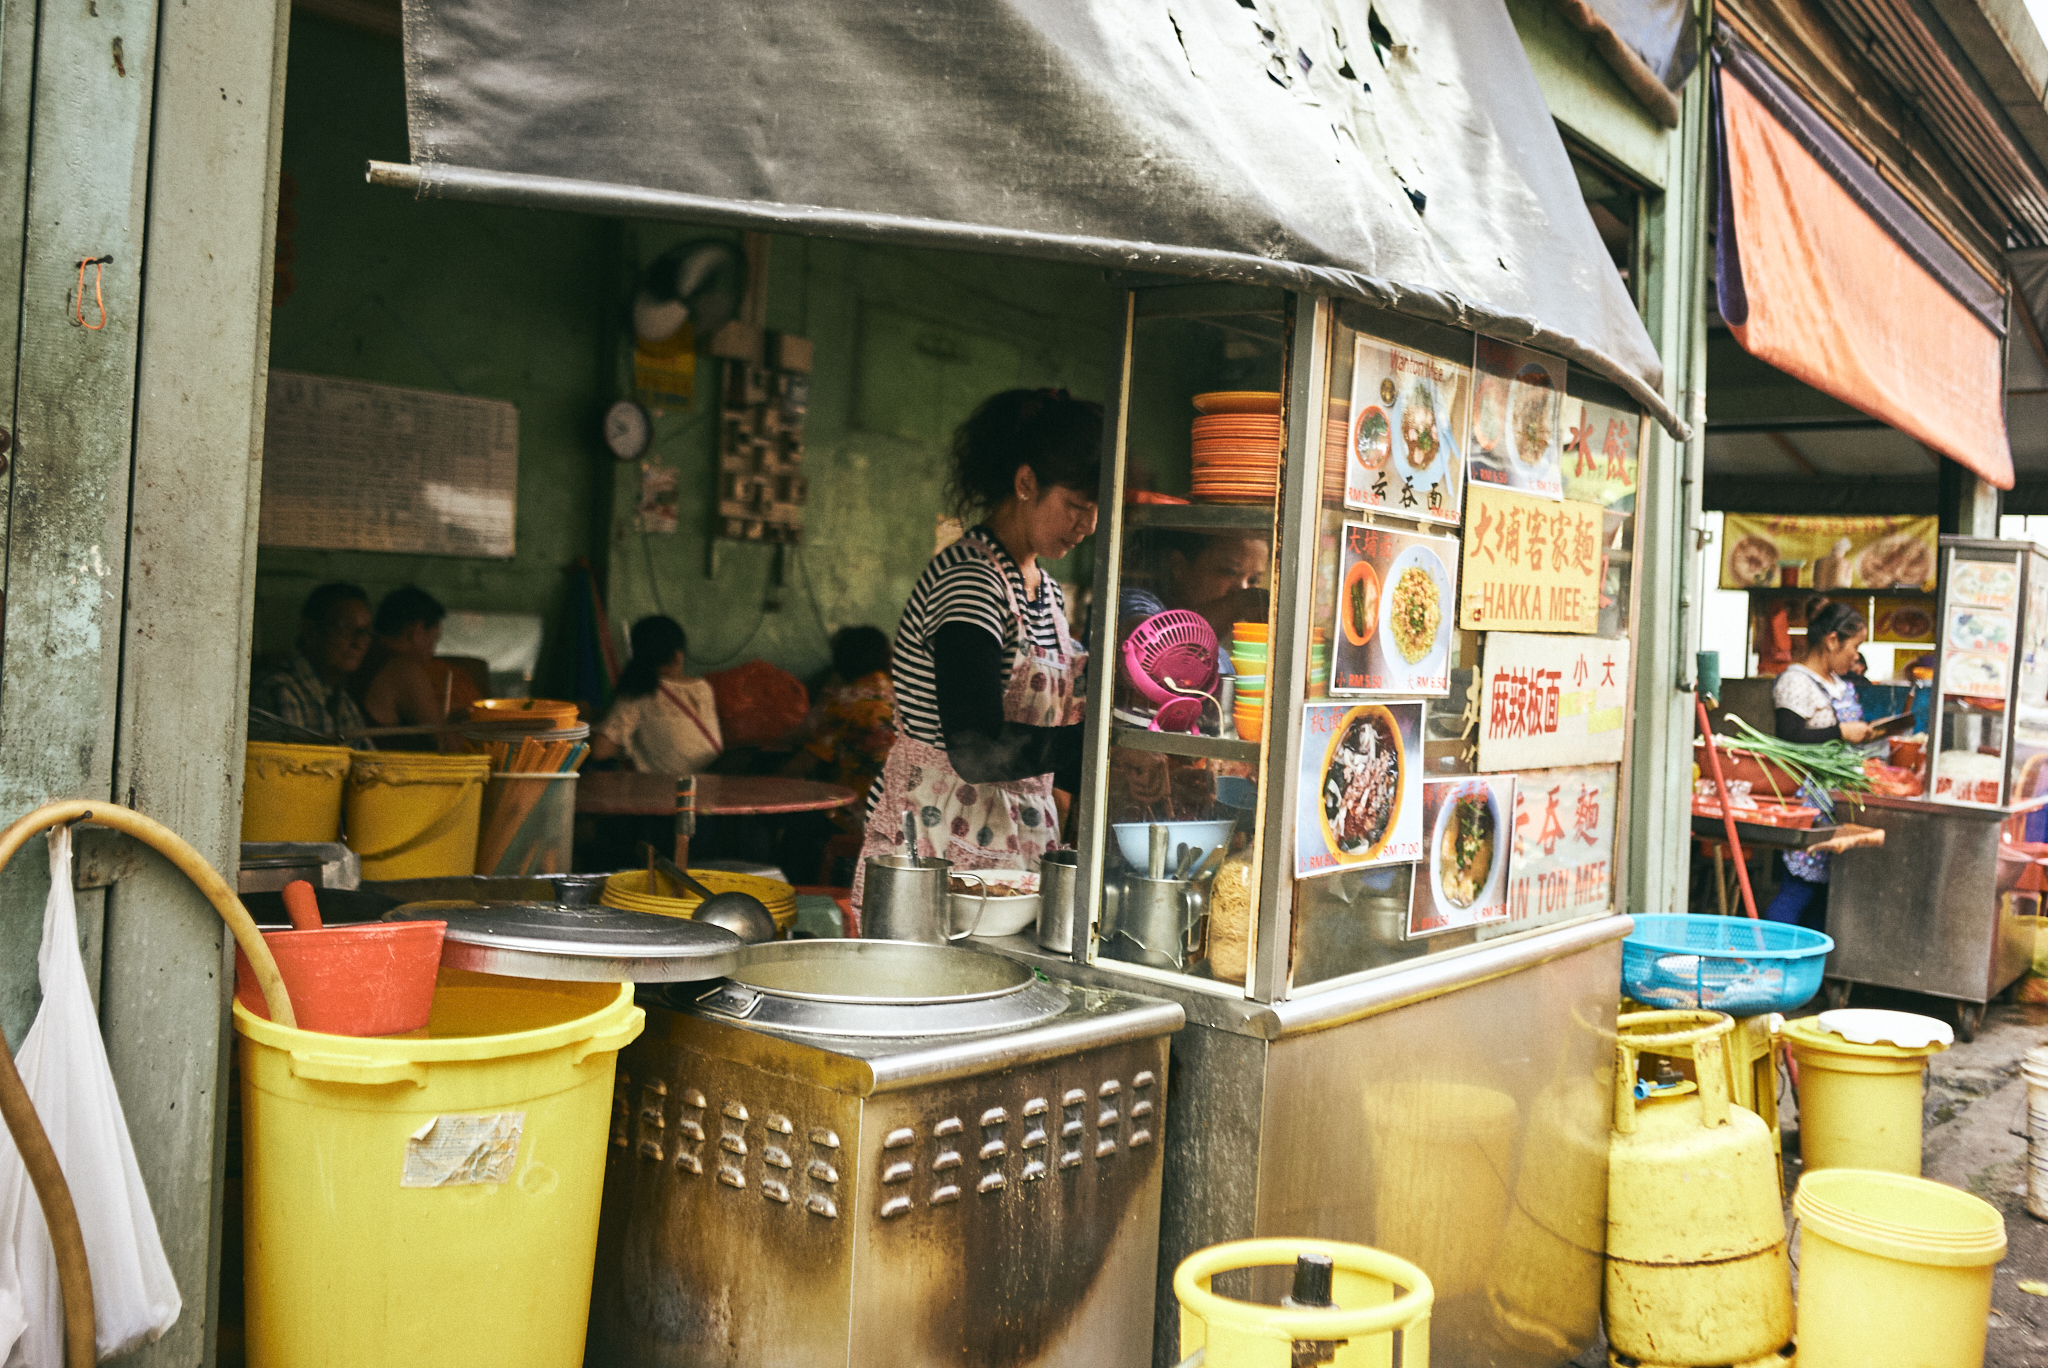 kuala lumpur street photography, hawkers stalls